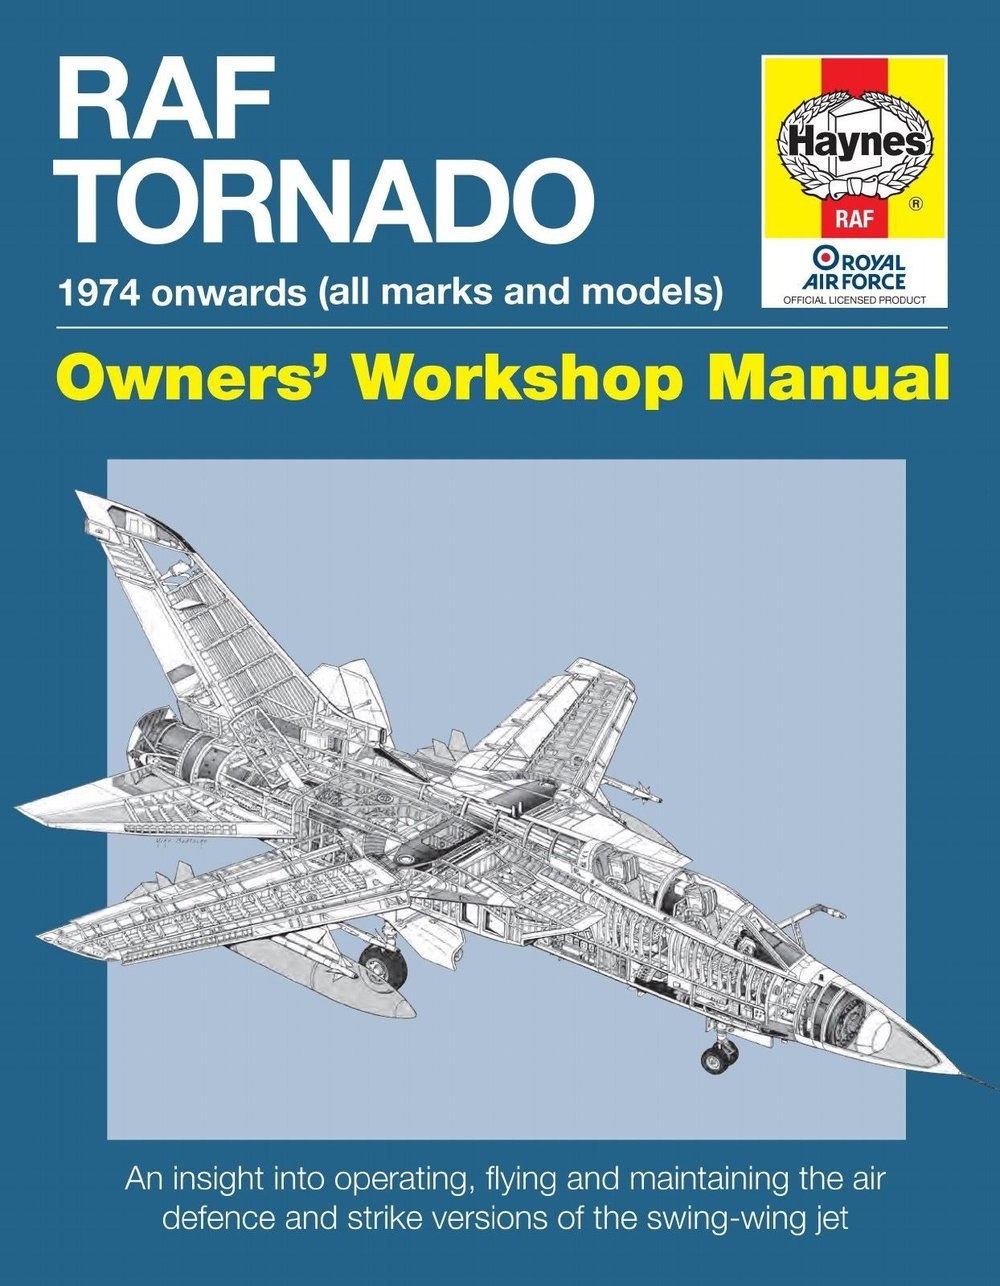 - Haynes RAF Tornado Manual £21.99